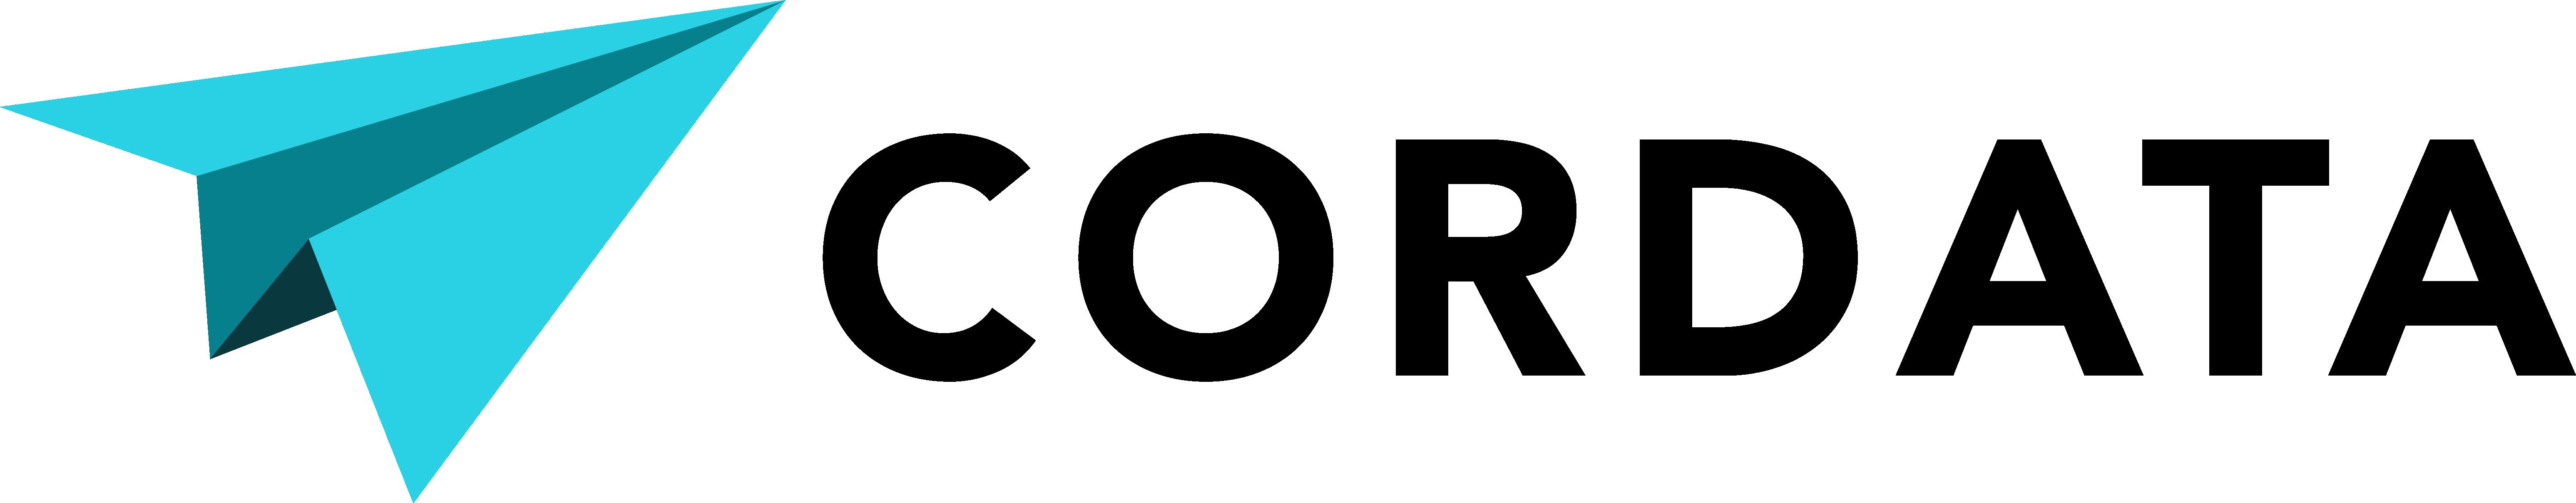 Cordata